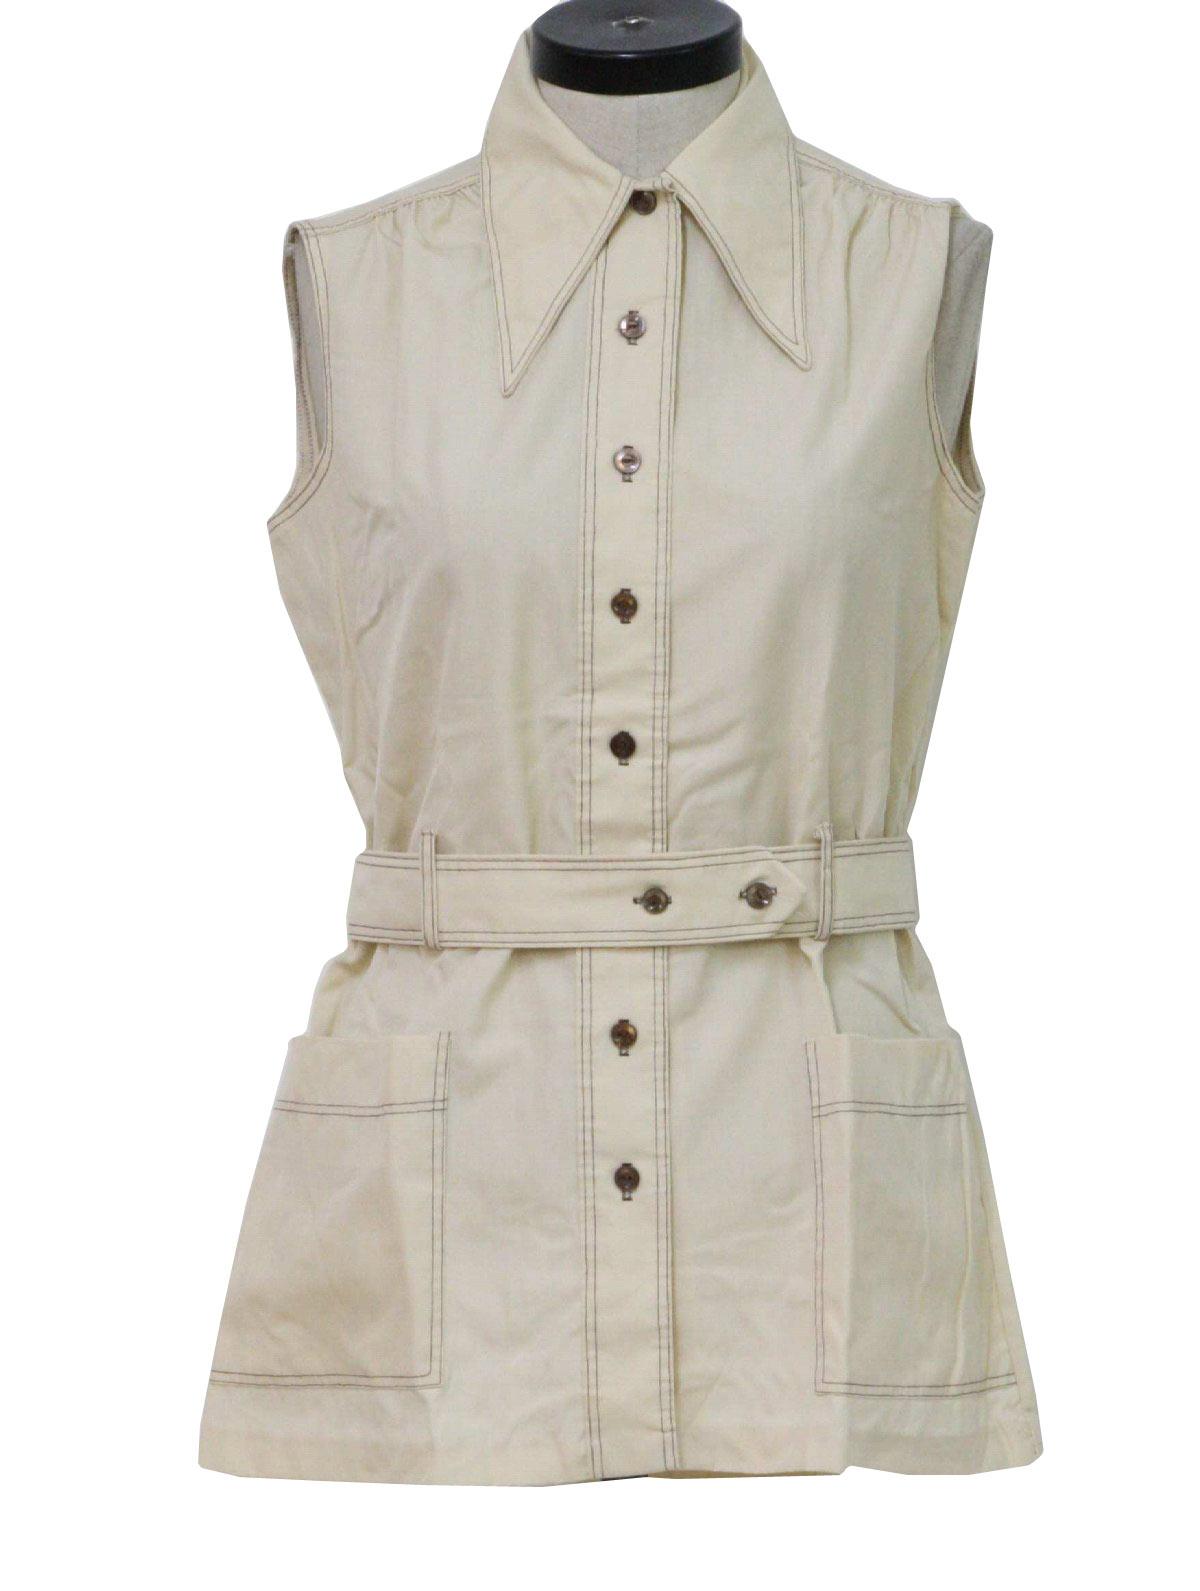 Retro 1970's Shirt (Fabric Label) : 70s -Fabric Label- Womens ...